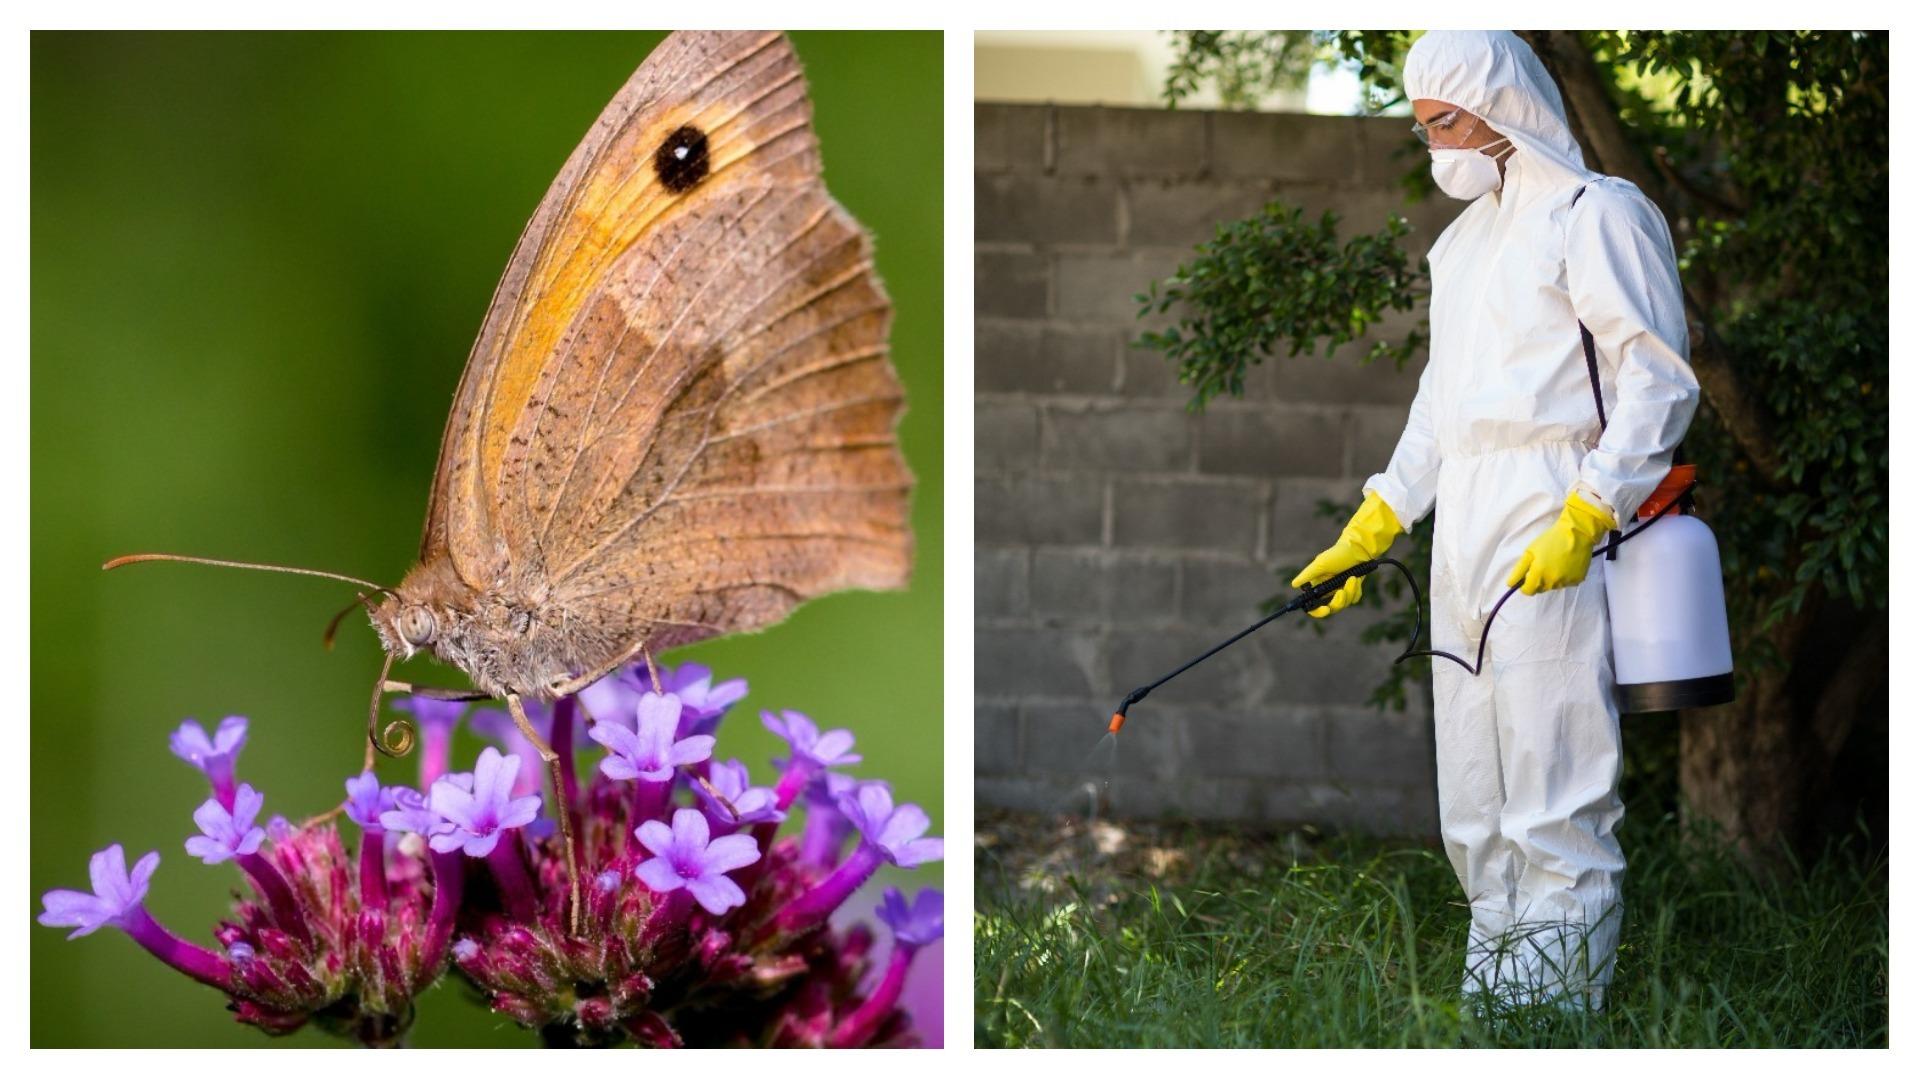 Pesticides impact our urban environment